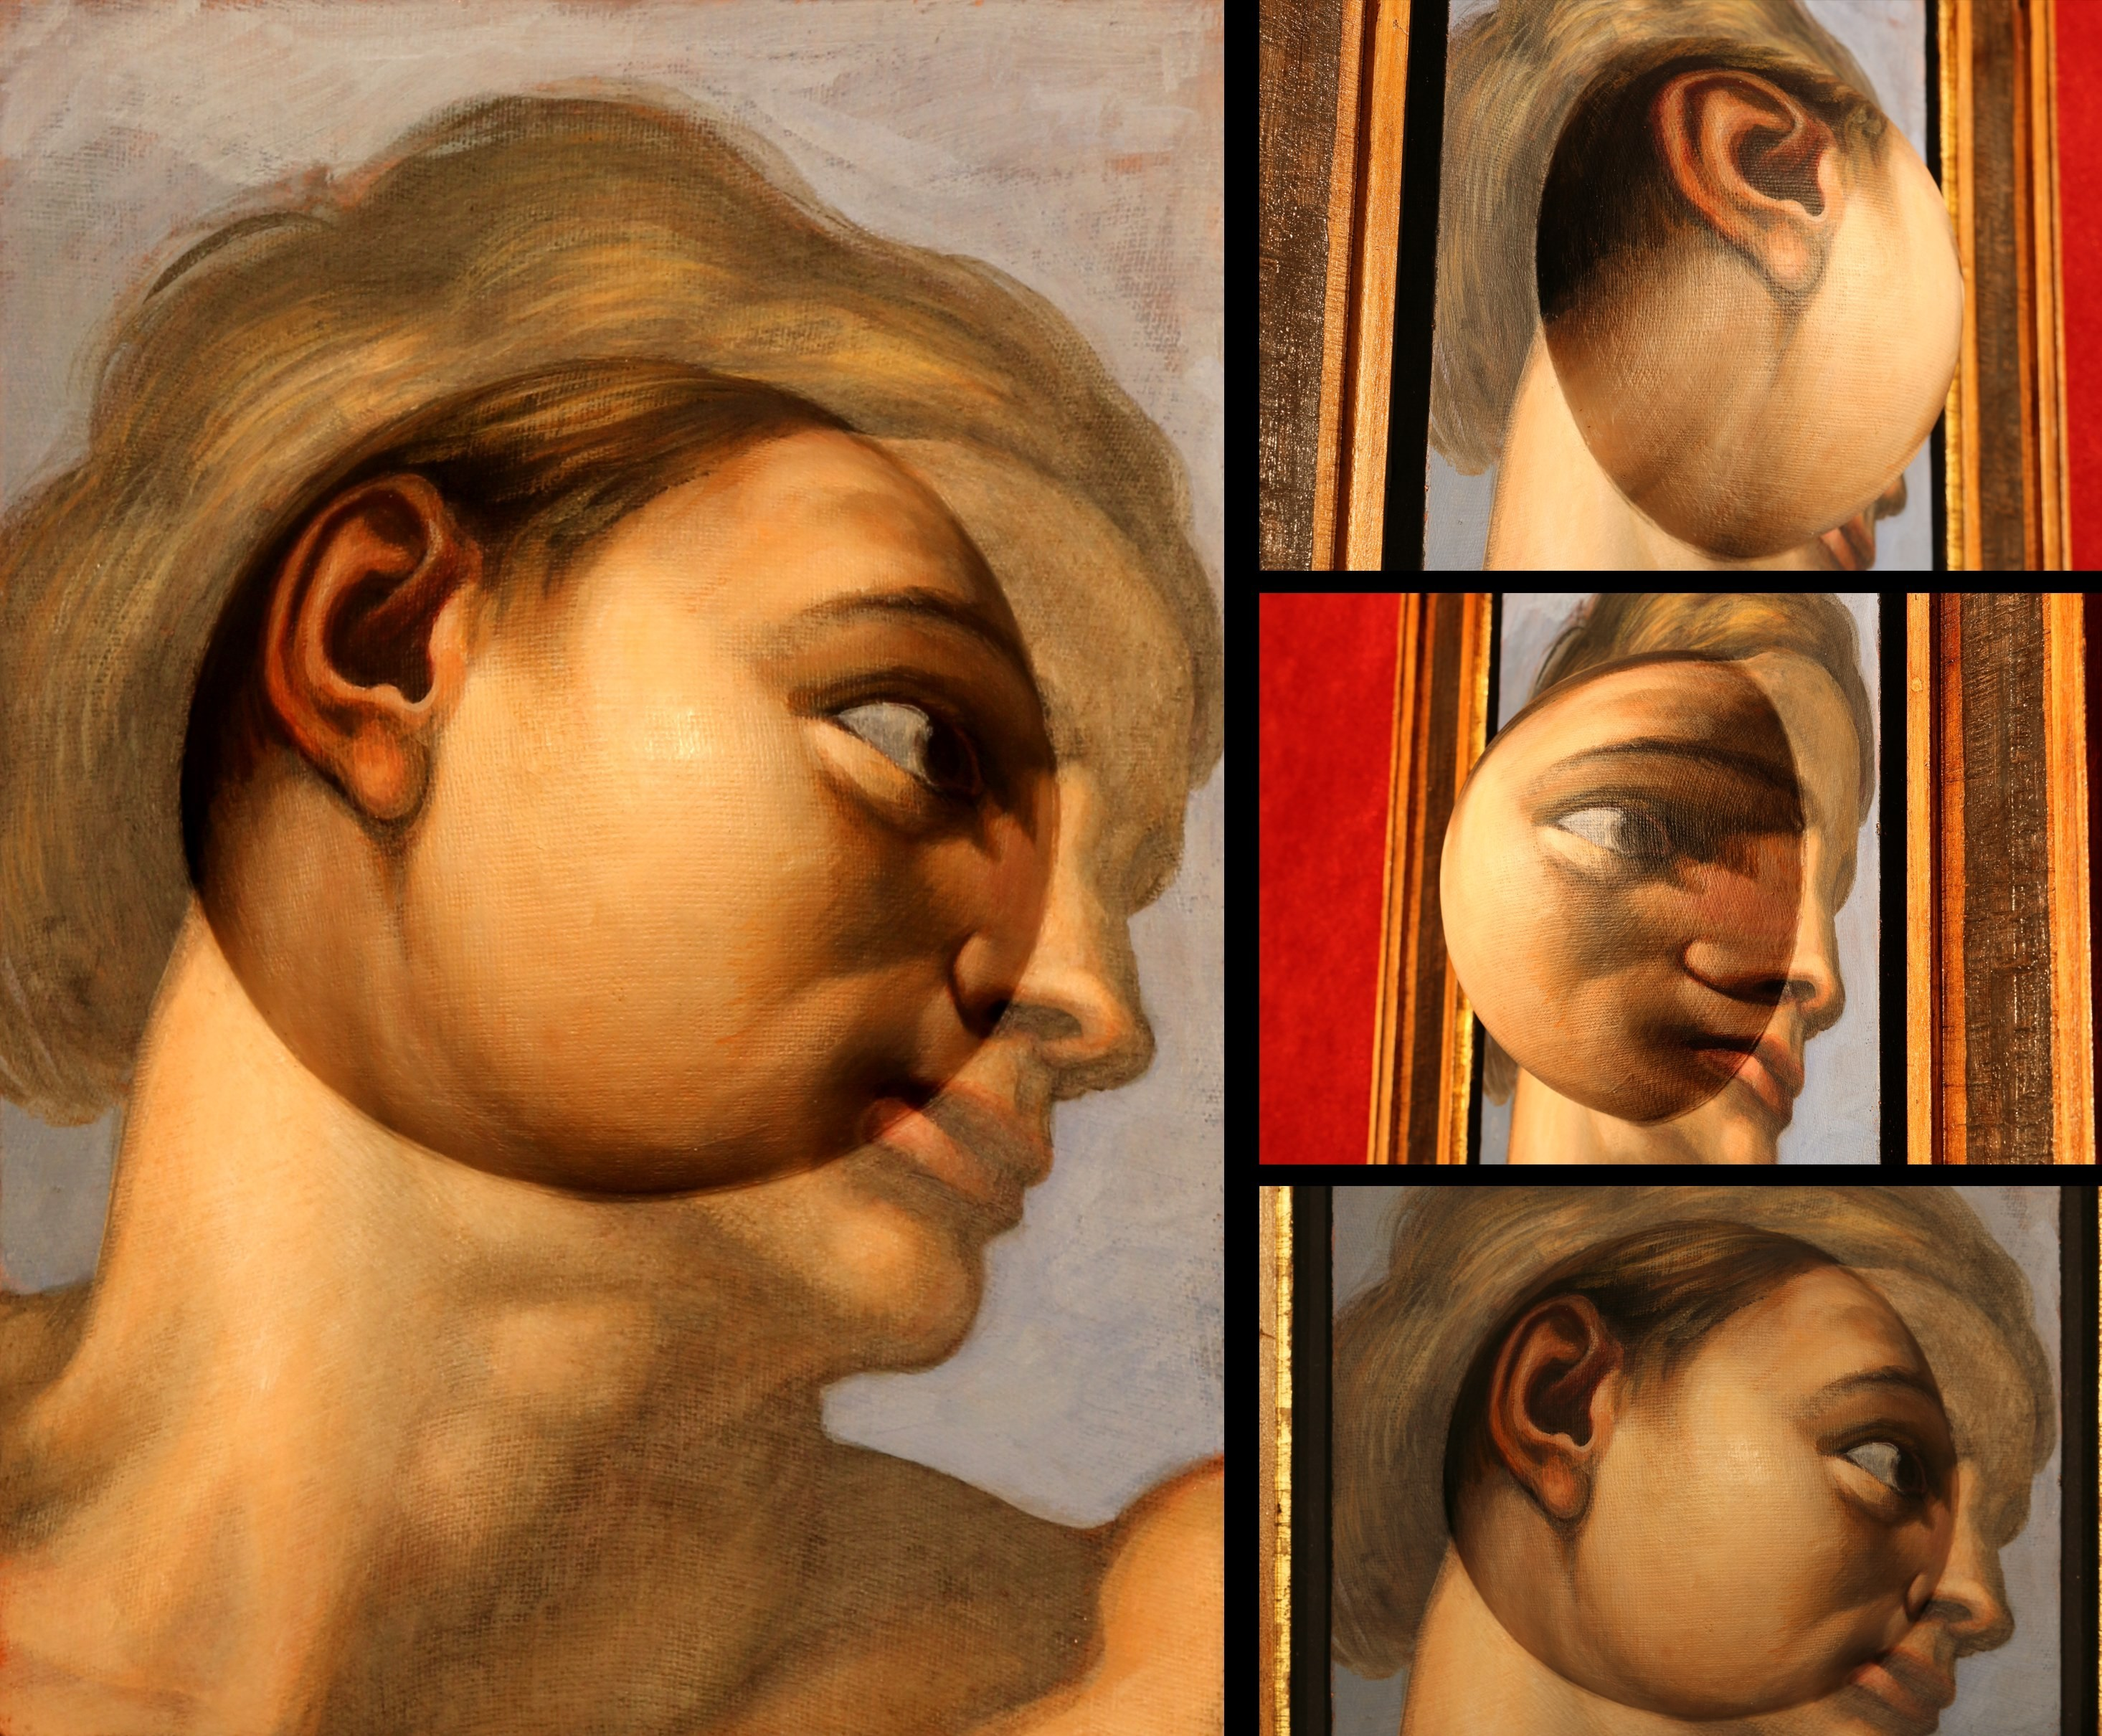 Adamo omaggio a Michelangelo